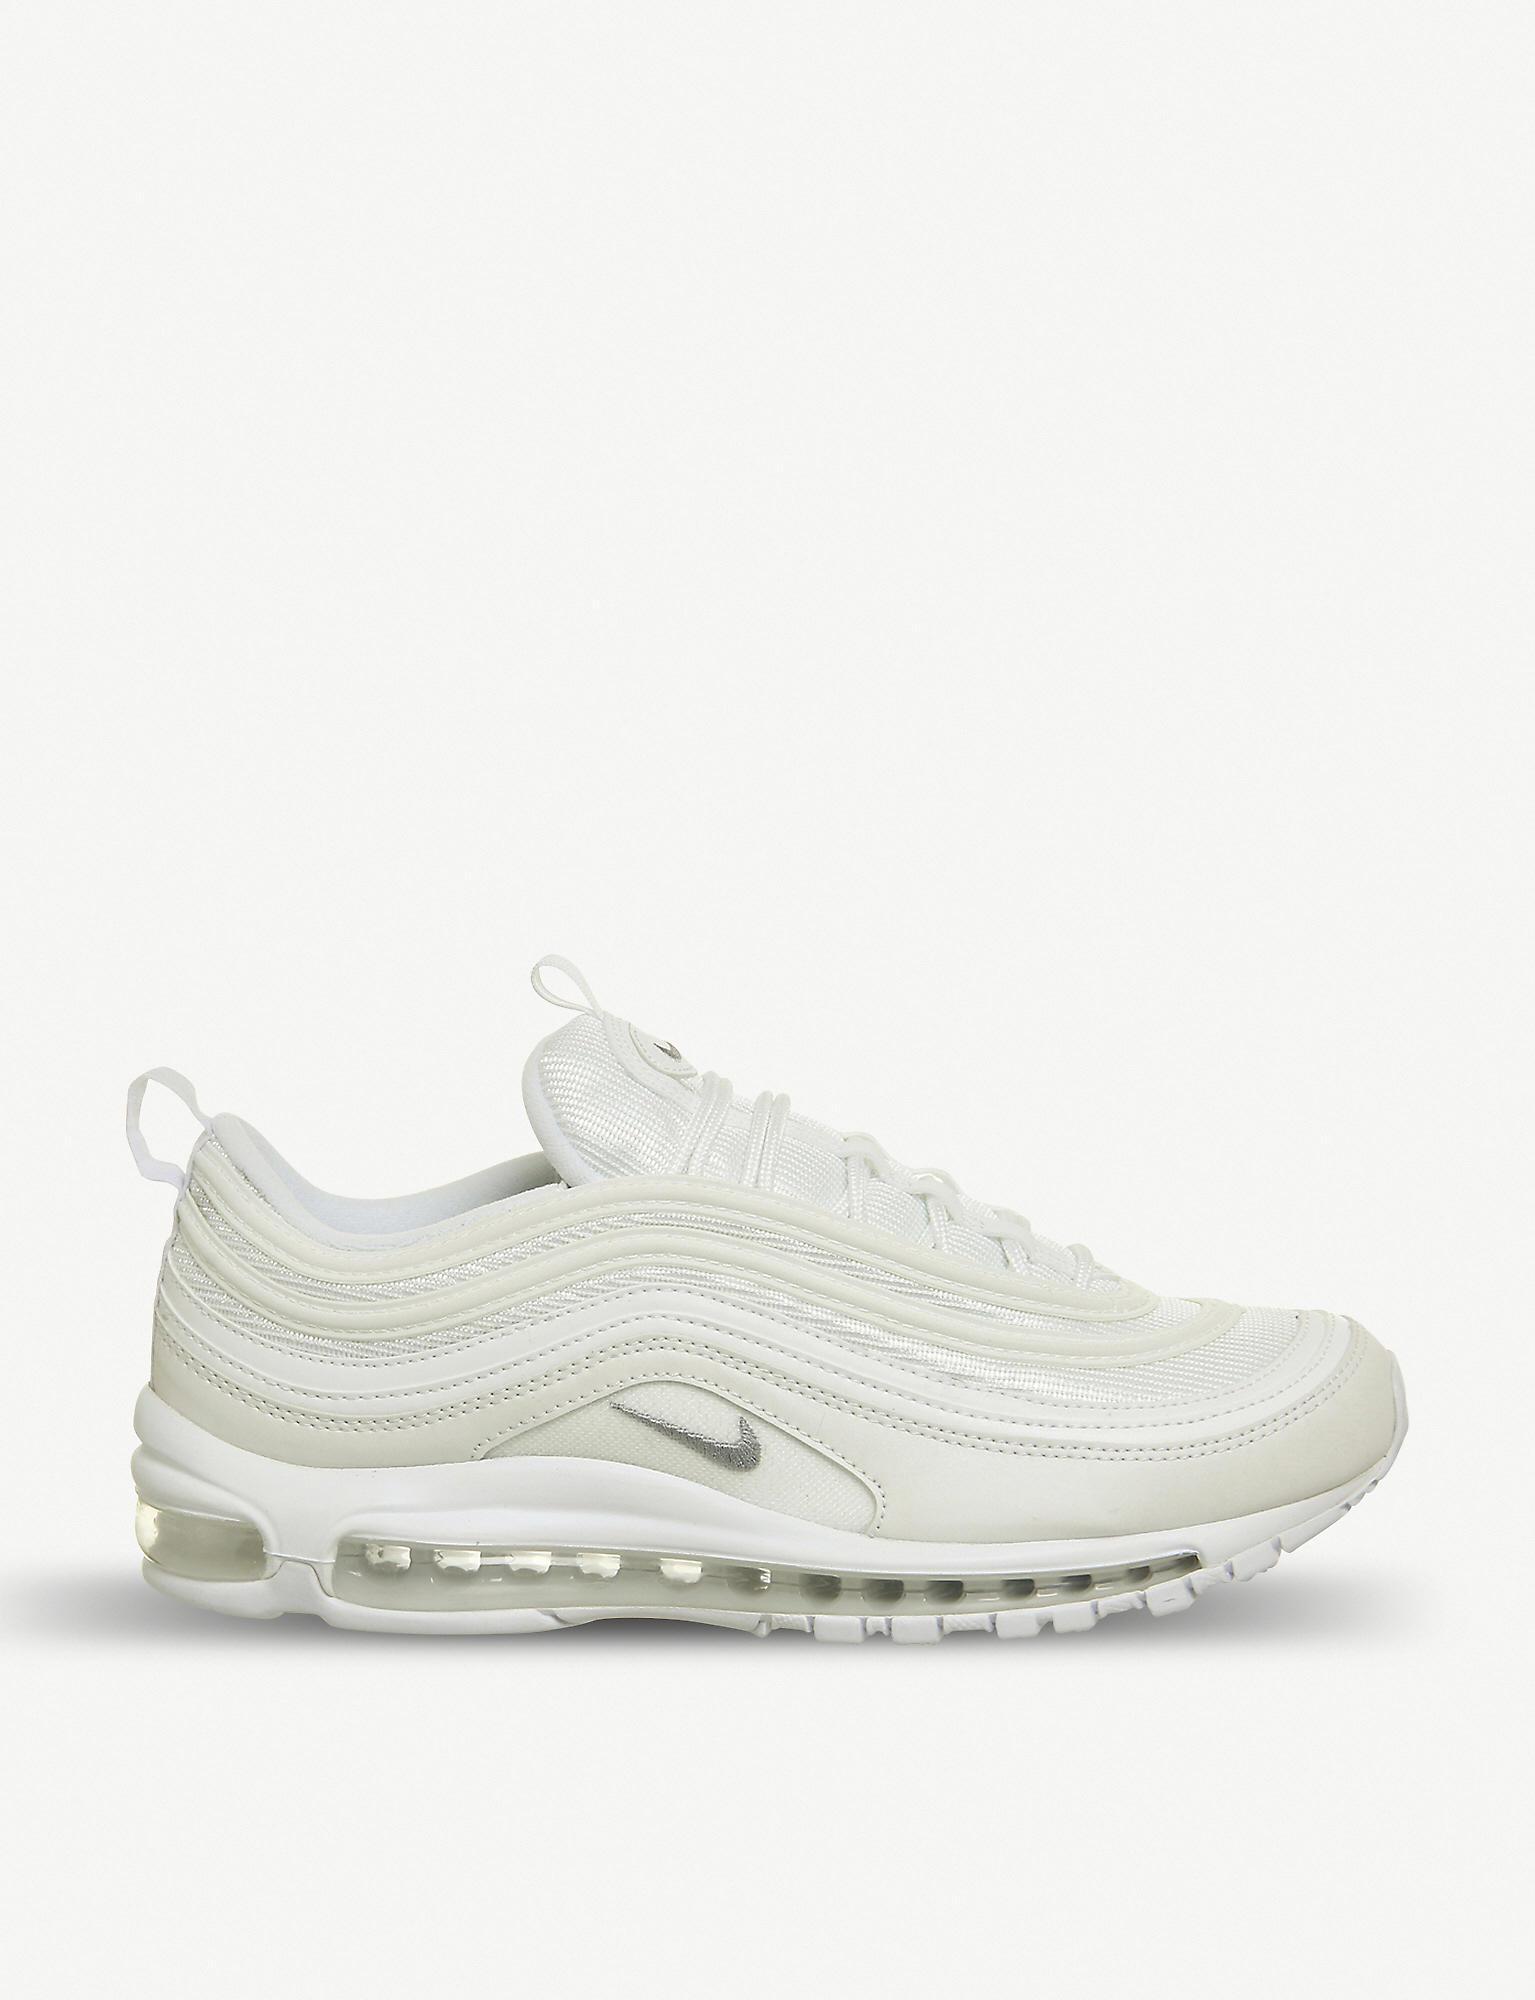 Nike Air Max 97 Ul '17 SE Unisex Leather Light Grey White